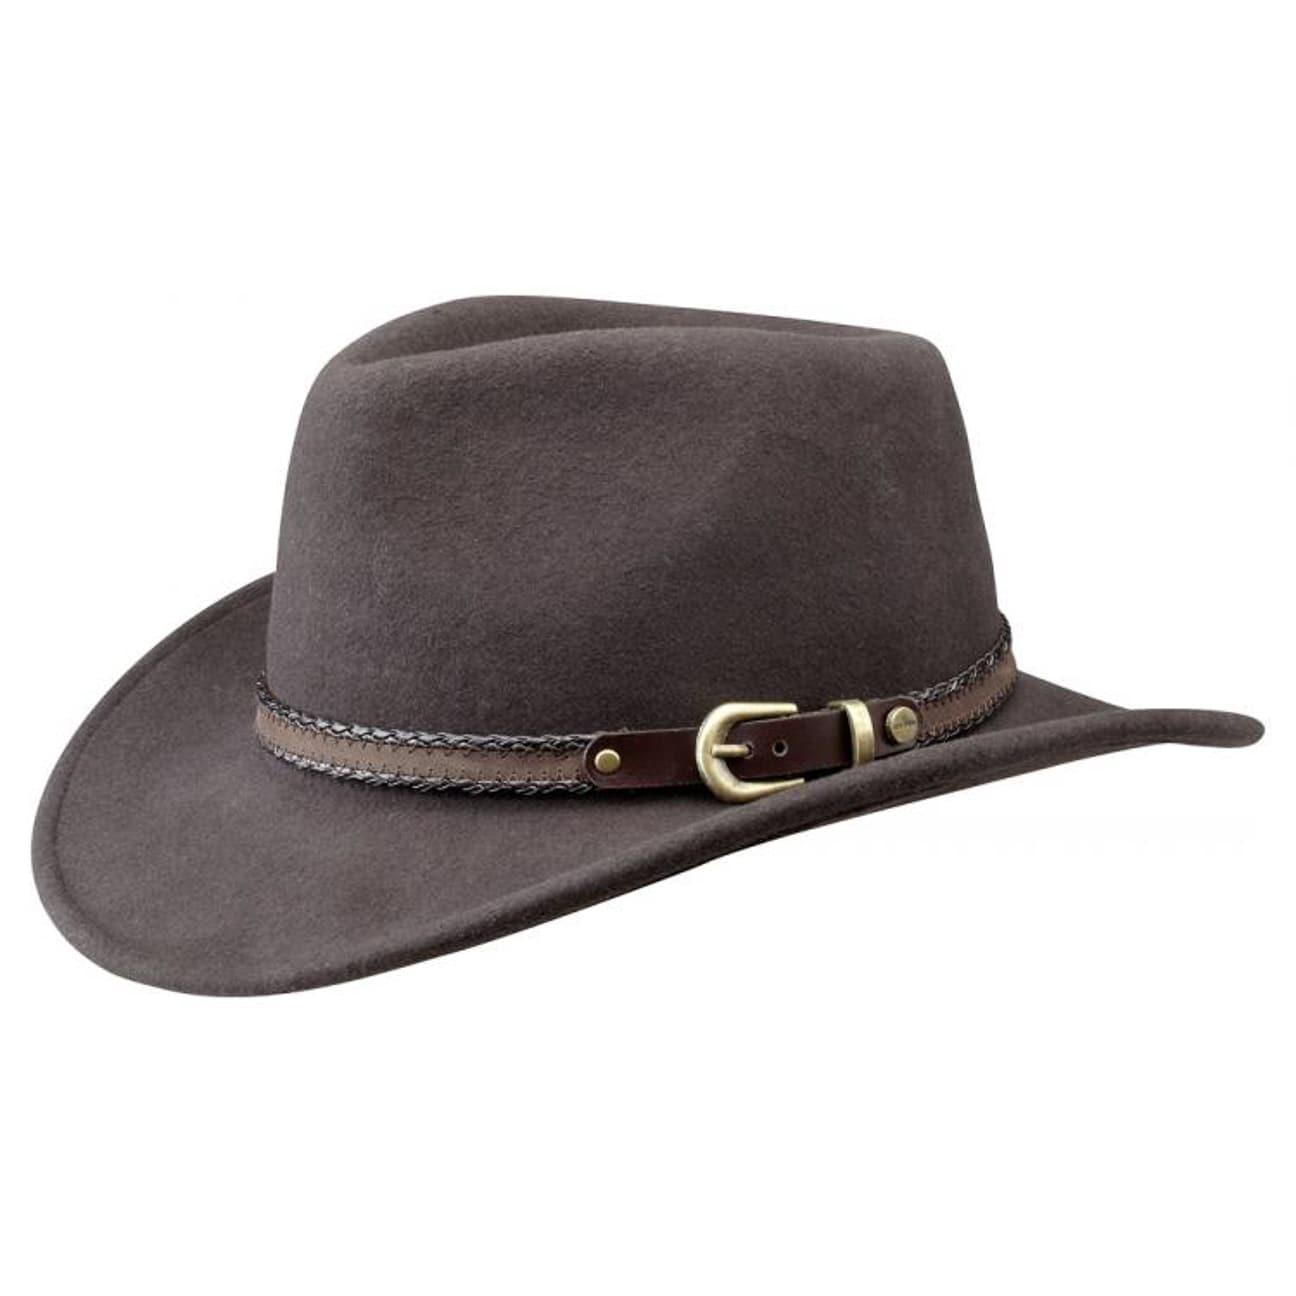 e64b0c7bf568f Sombrero del Oeste Sanger by Stetson - Sombreros - sombreroshop.es